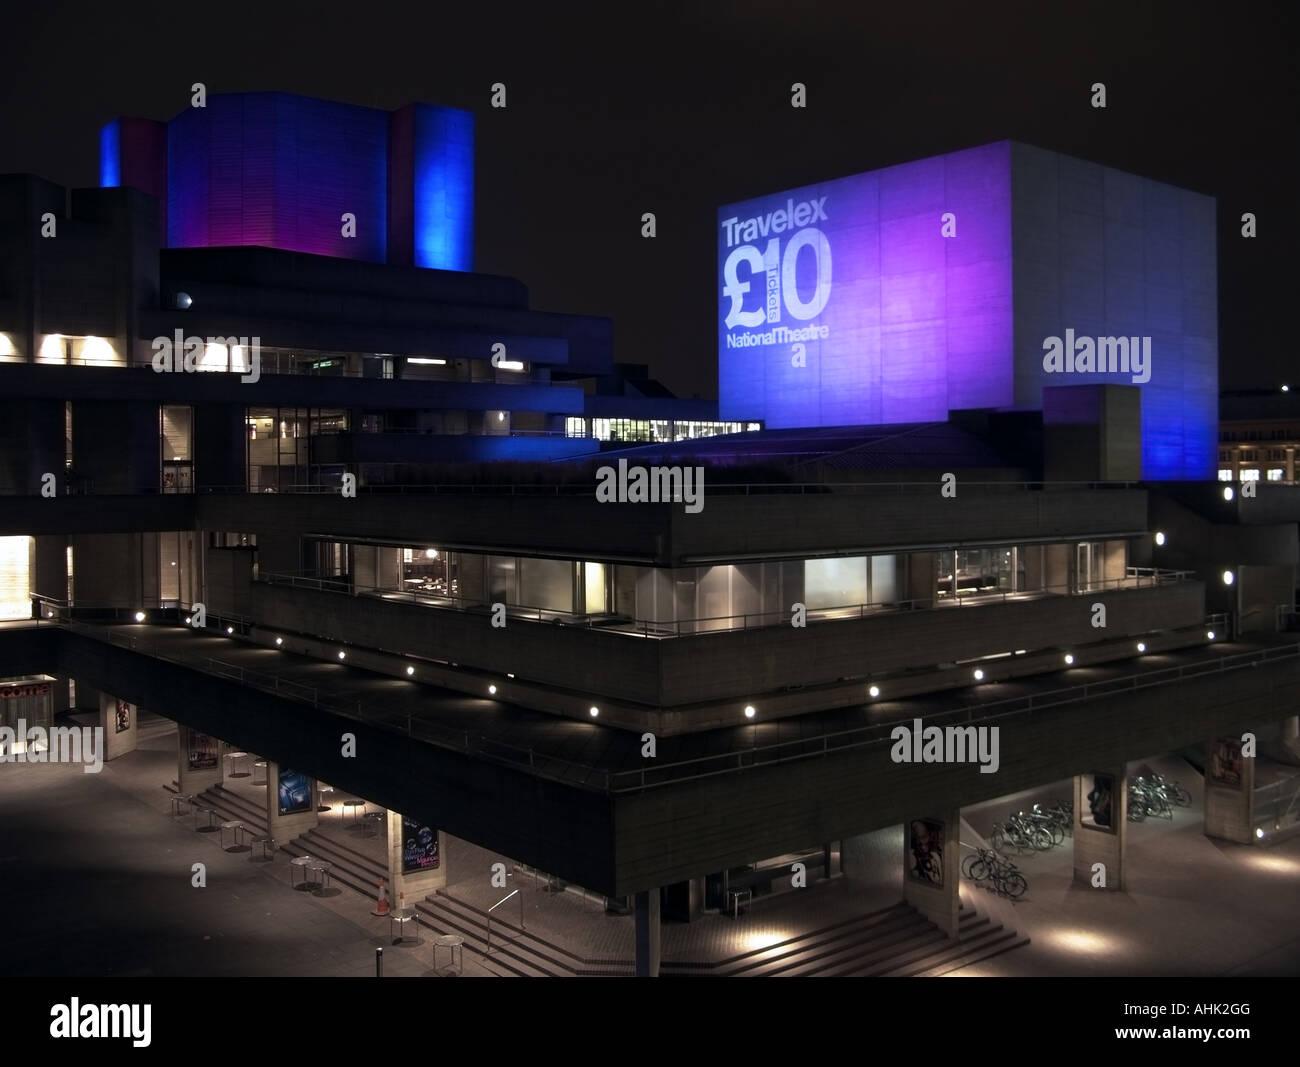 National Theatre, London, UK - Stock Image